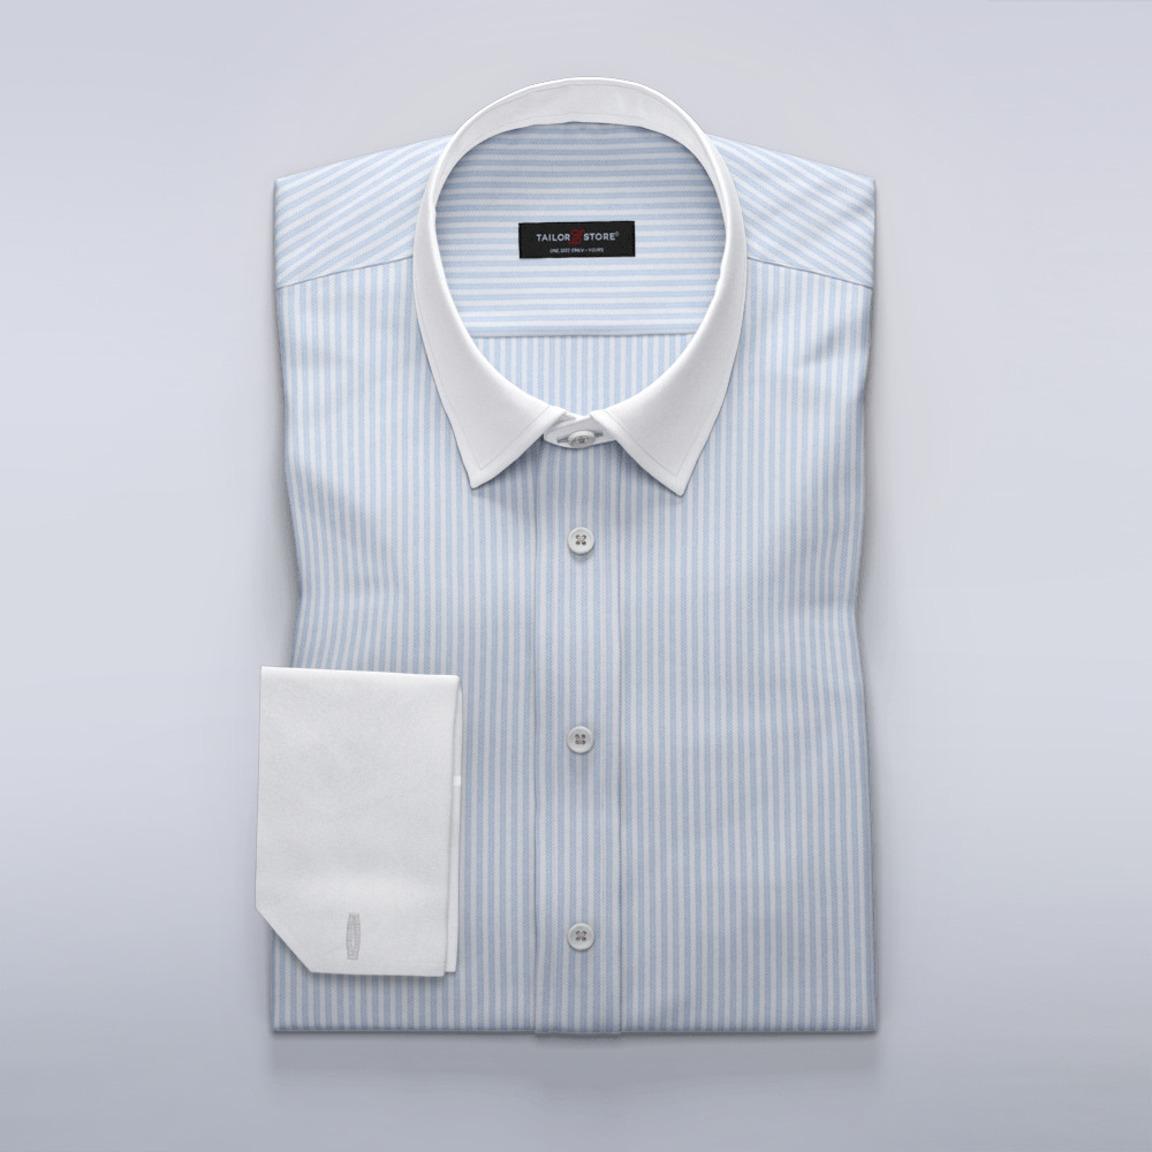 Businesskjorta i exklusiv vit och blå herringbone